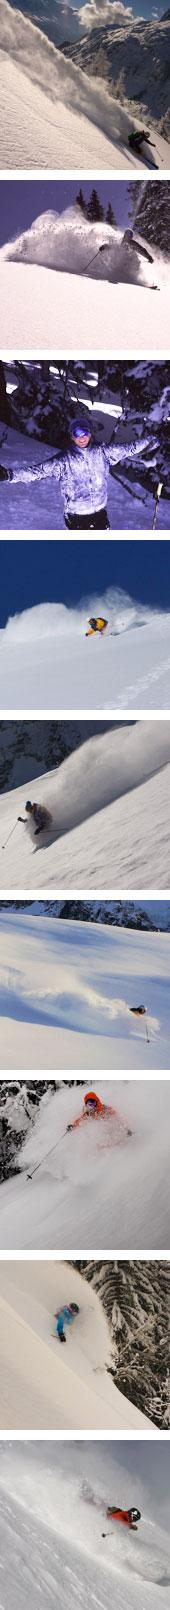 guided off piste skiing ski best snow